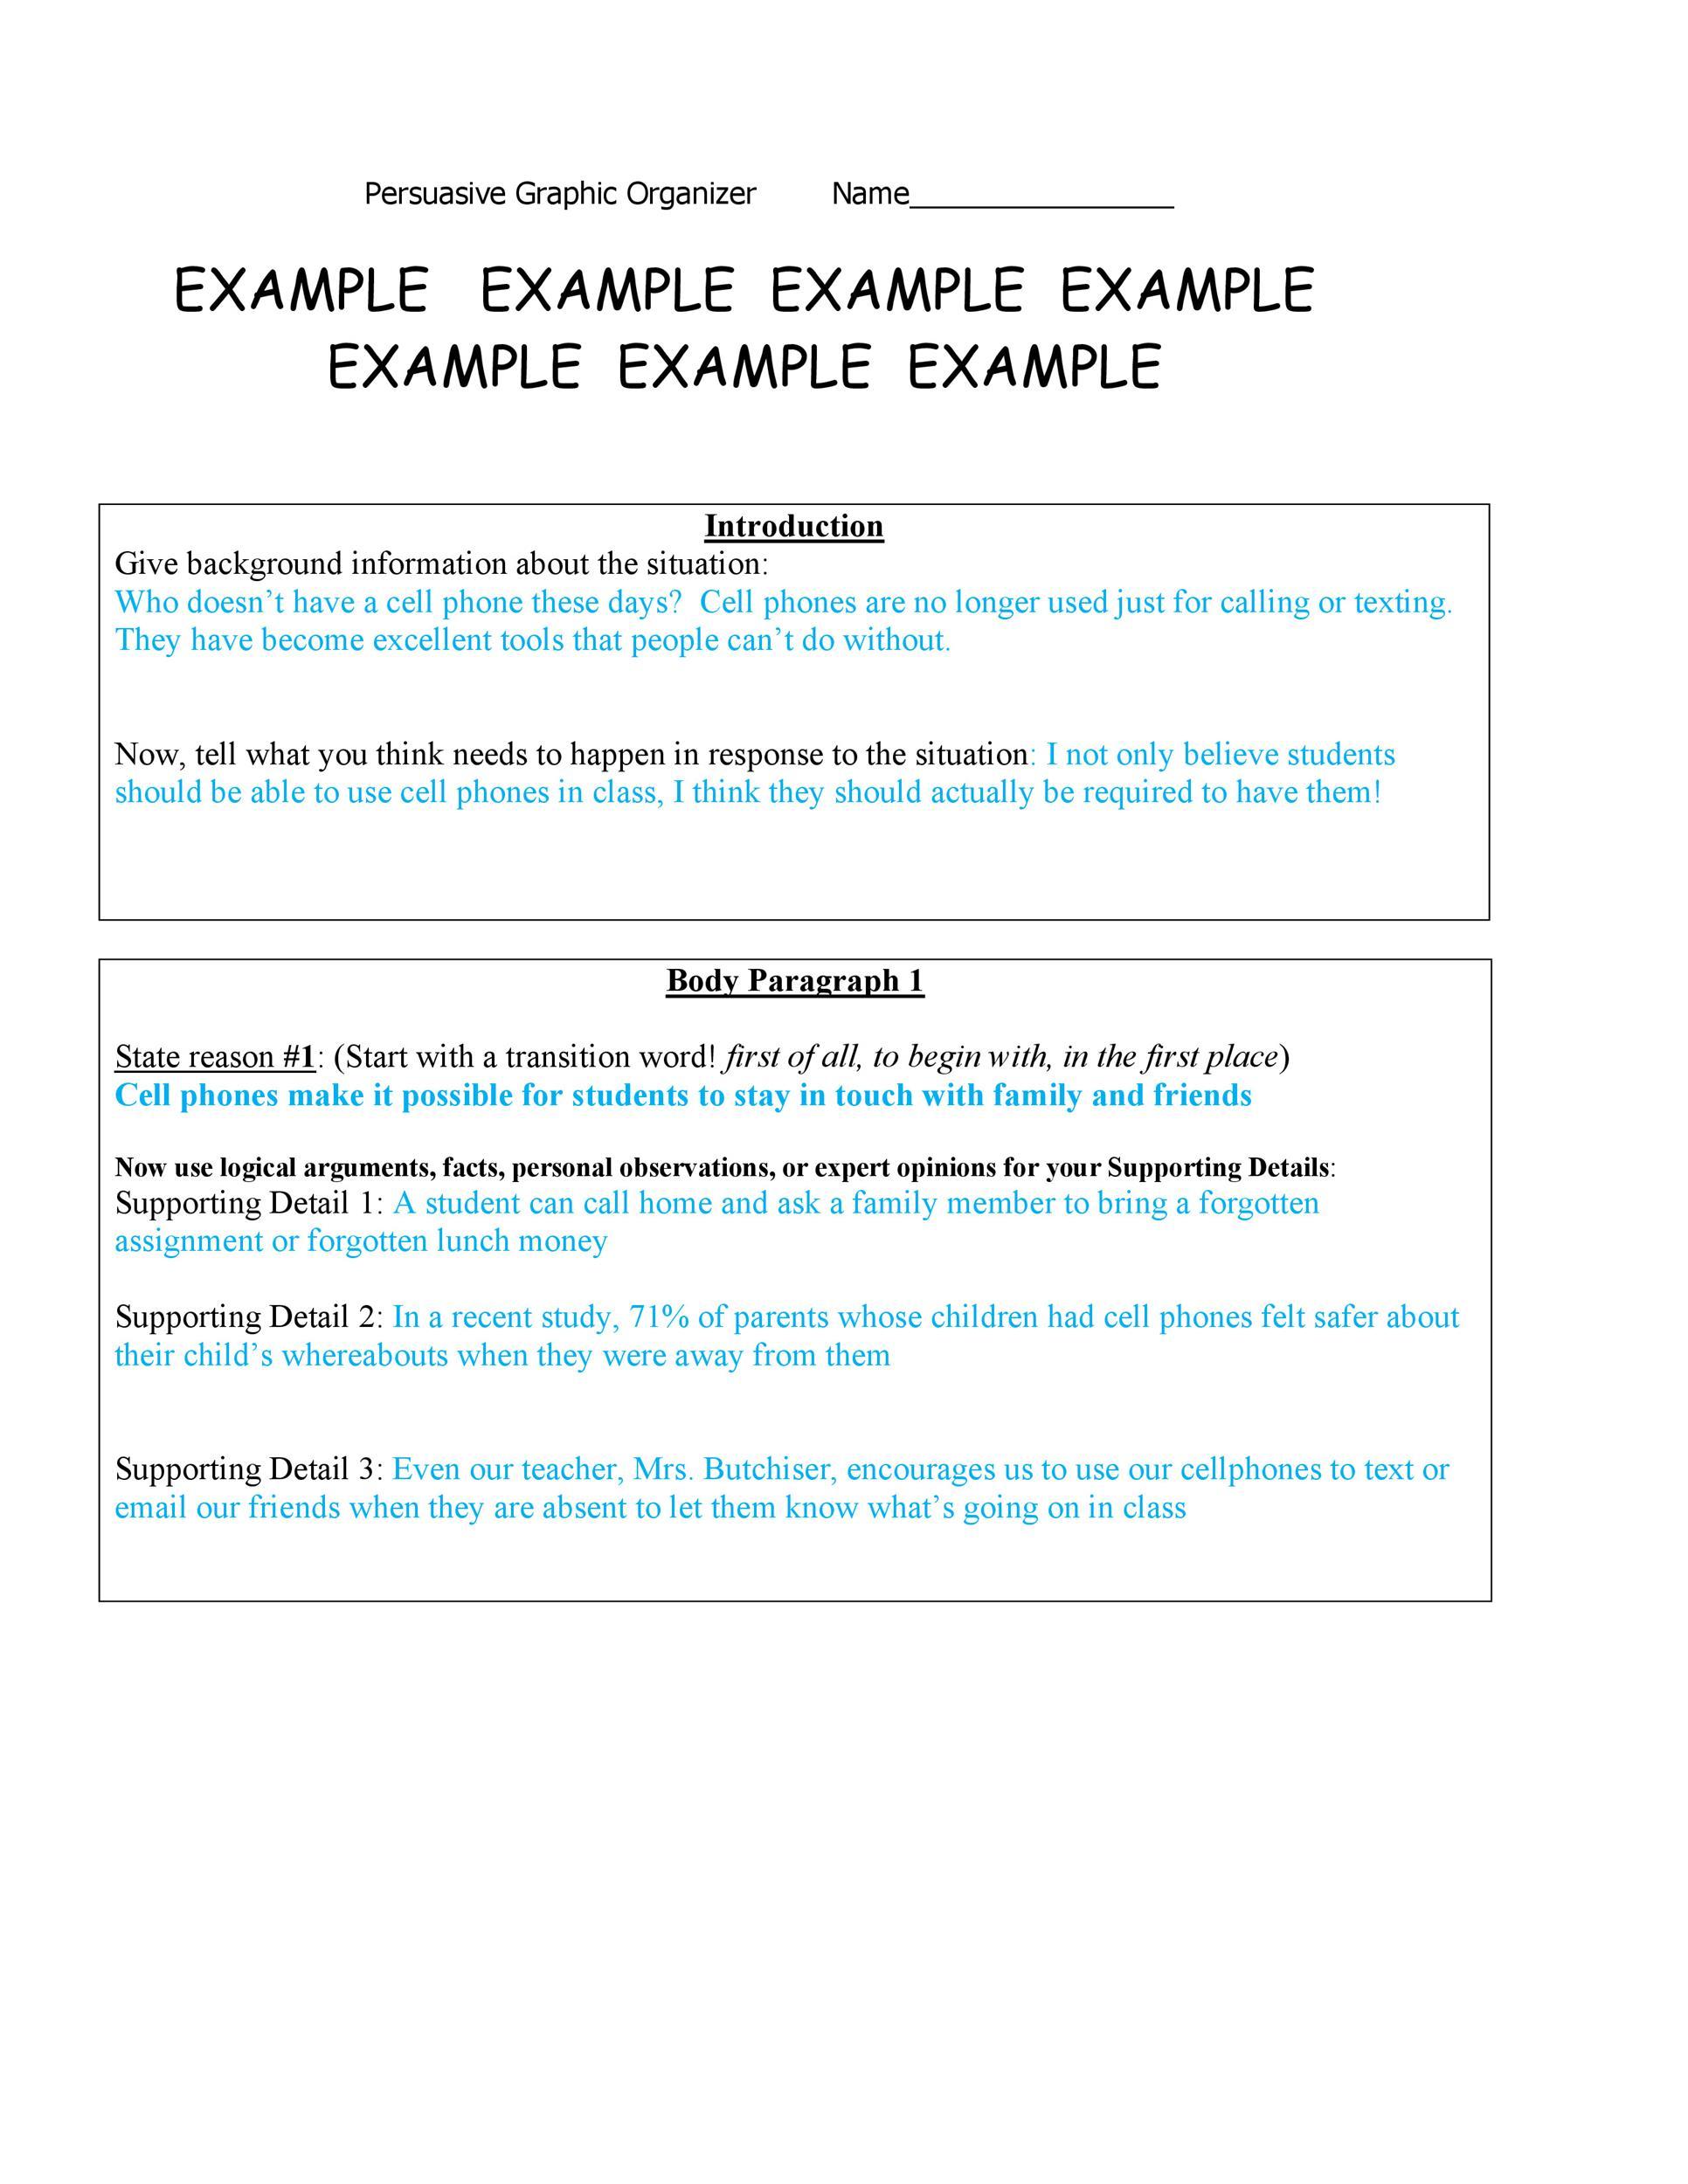 Free persuasive essay example 09